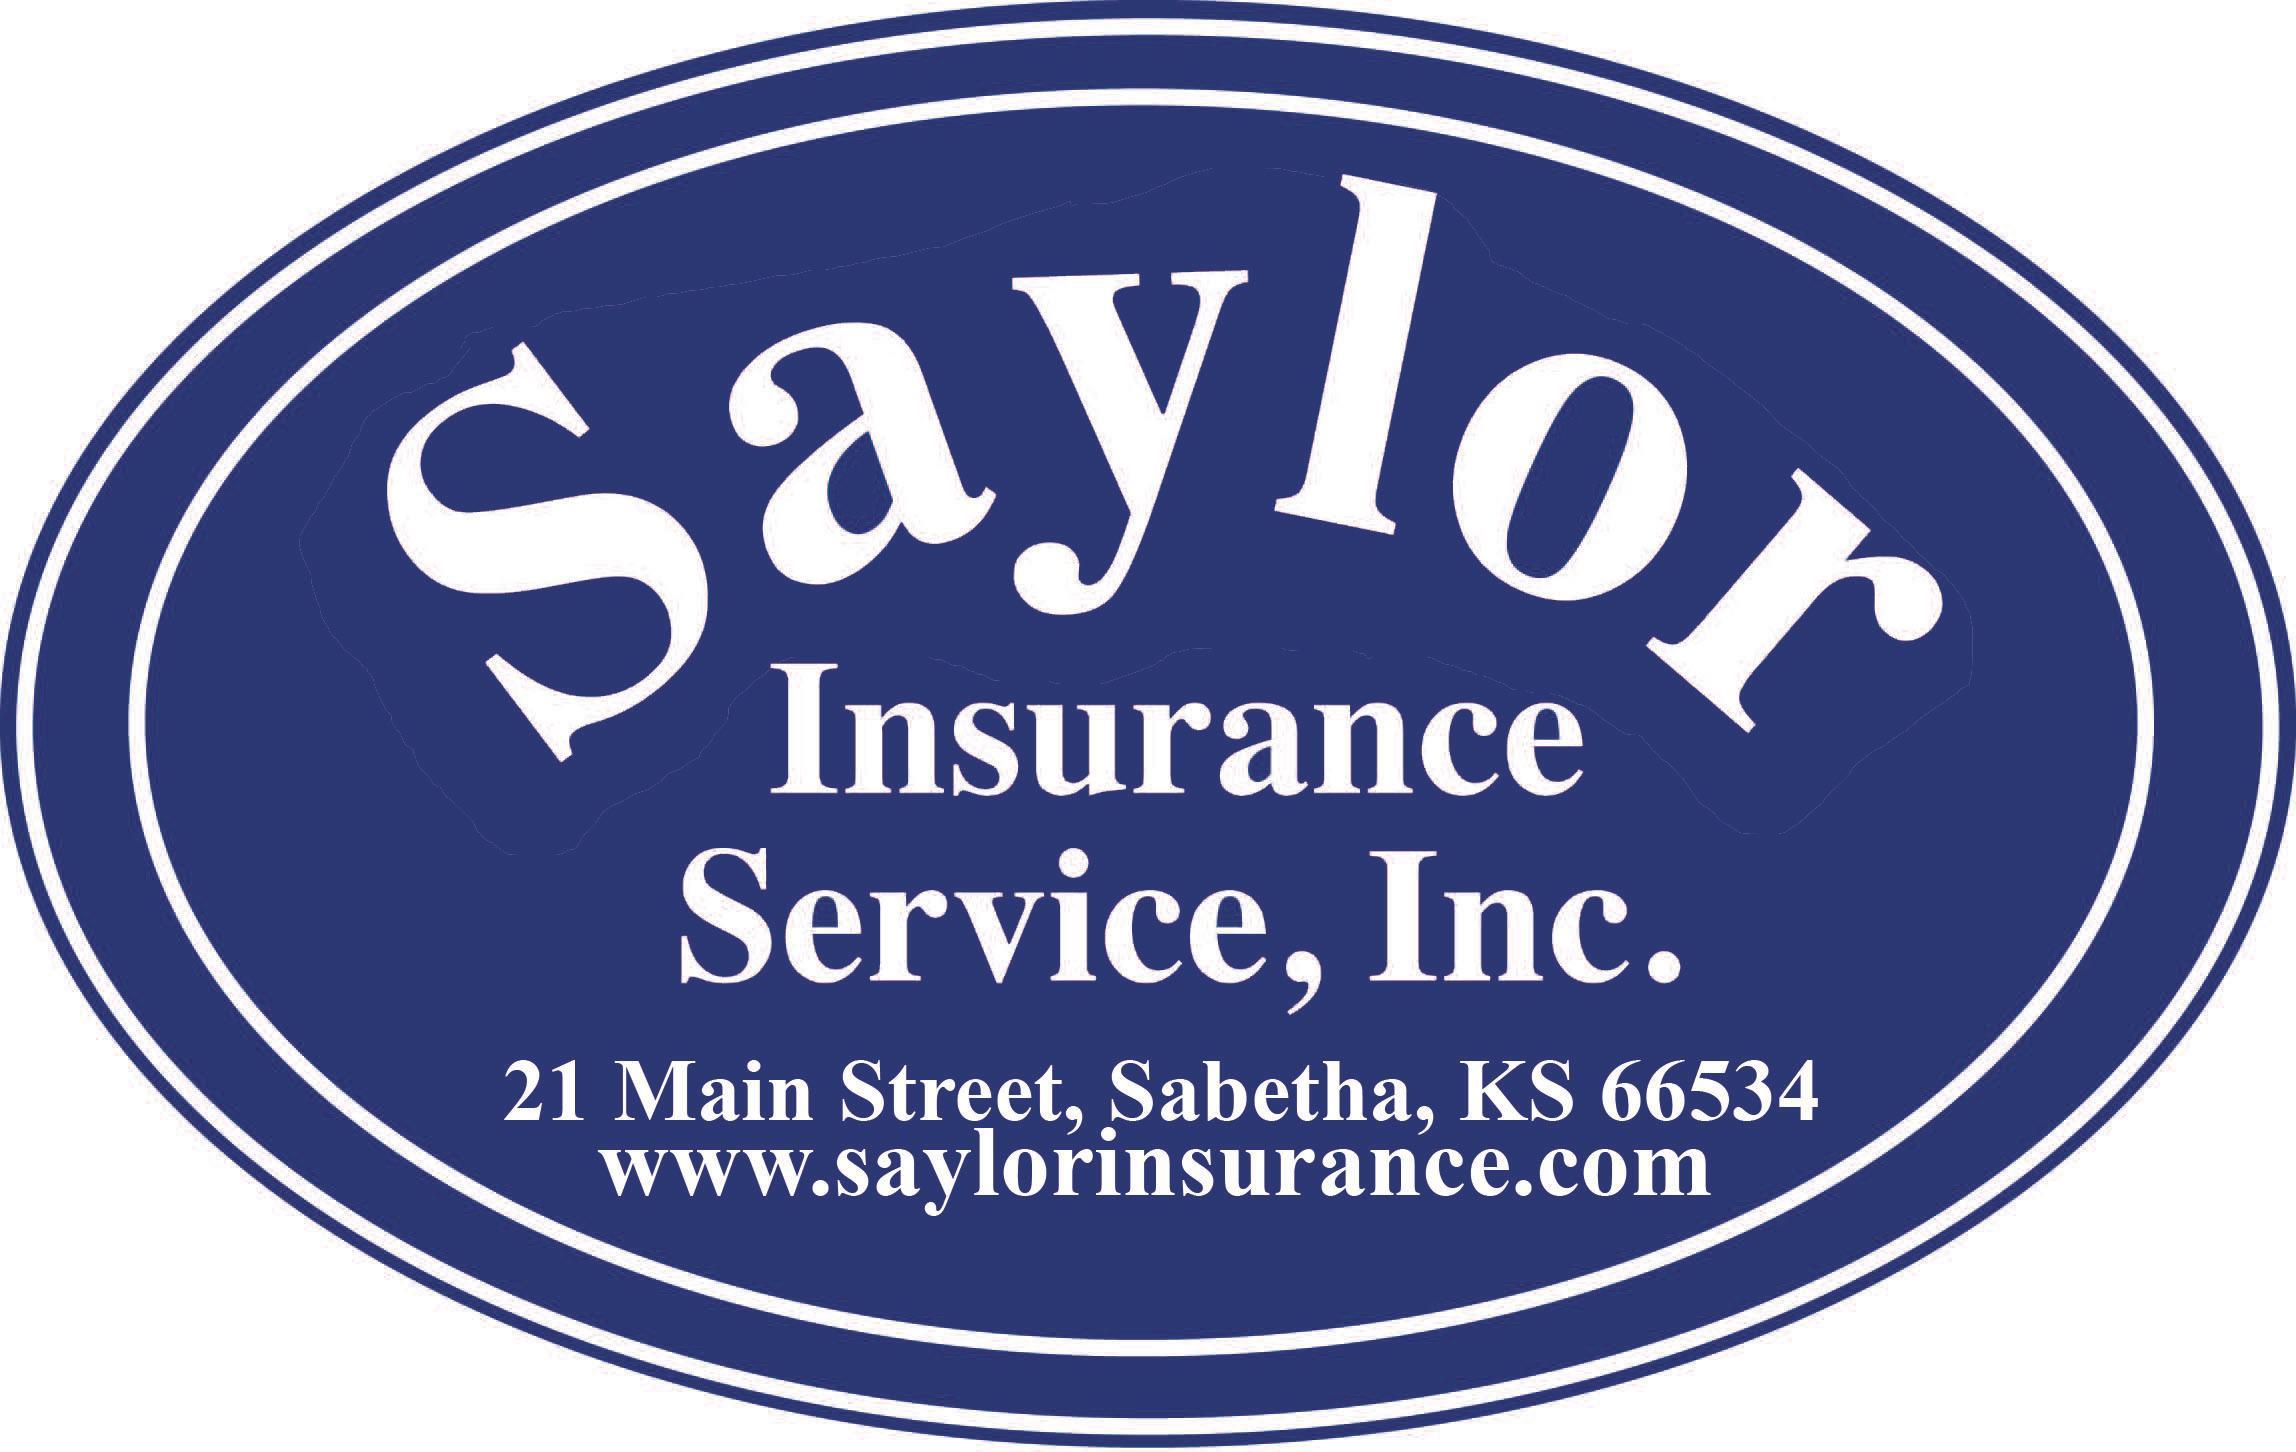 Saylor Insurance Service Inc